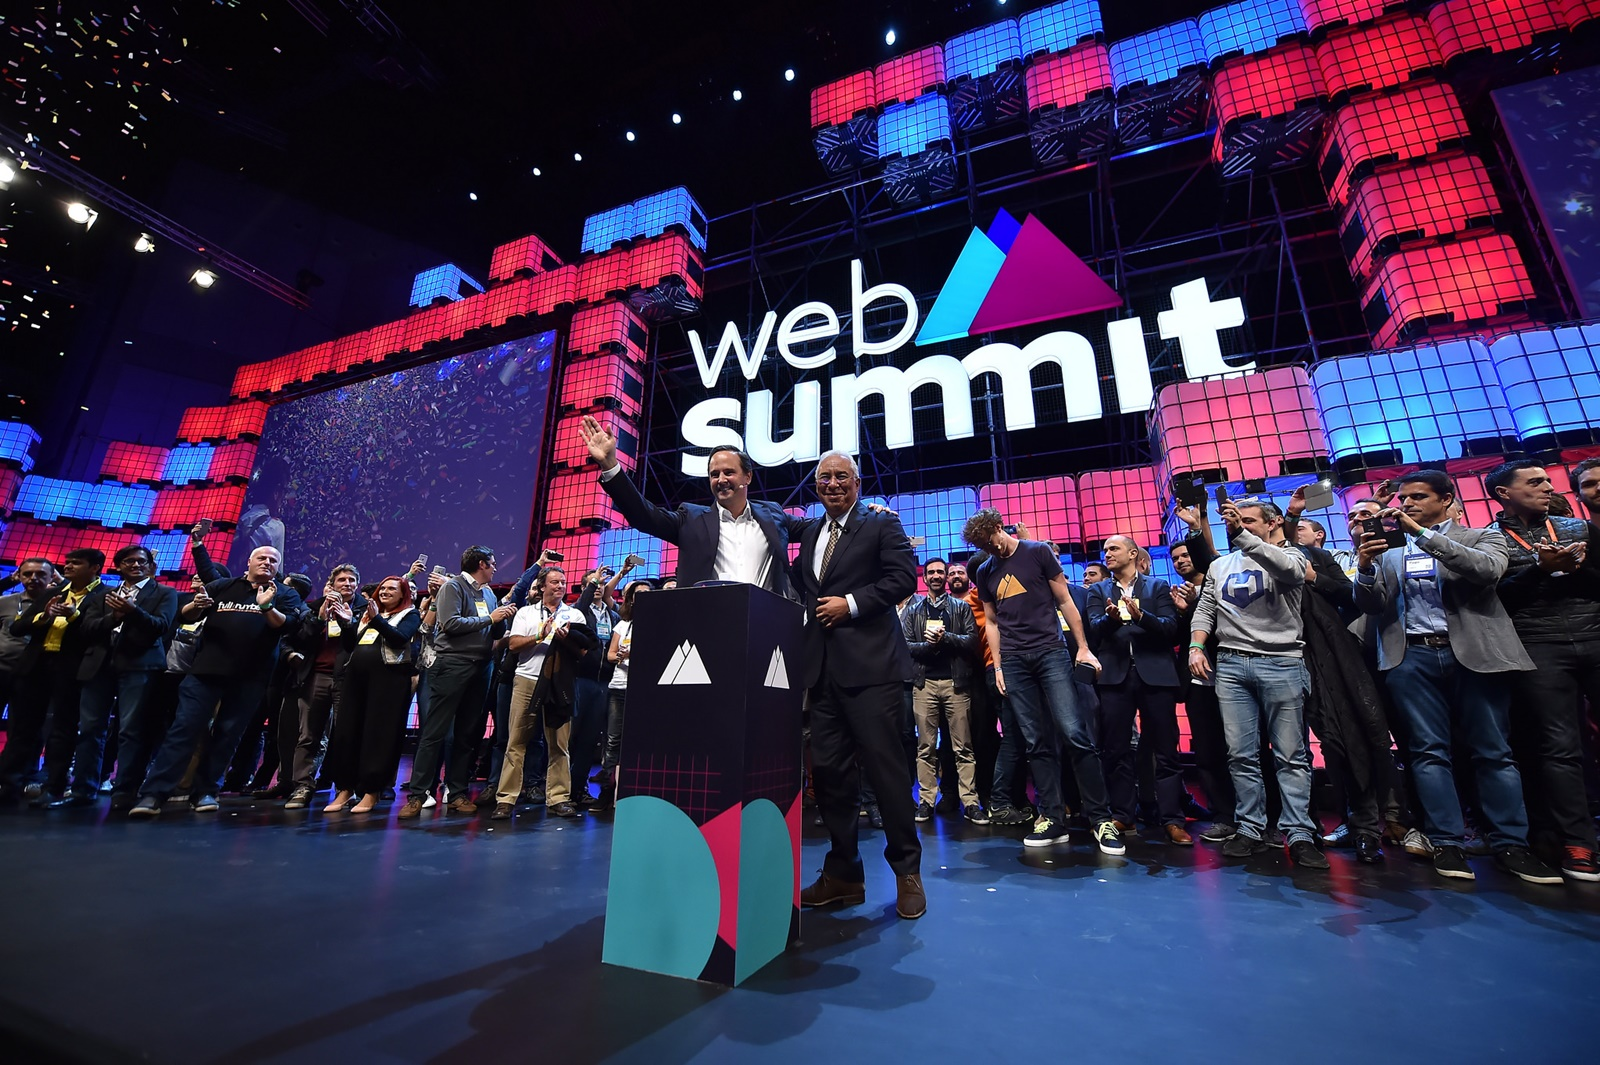 Starosta Lisabonu (vlevo) a premiér Portugalska (vpravo) zahajují Web Summit 2017